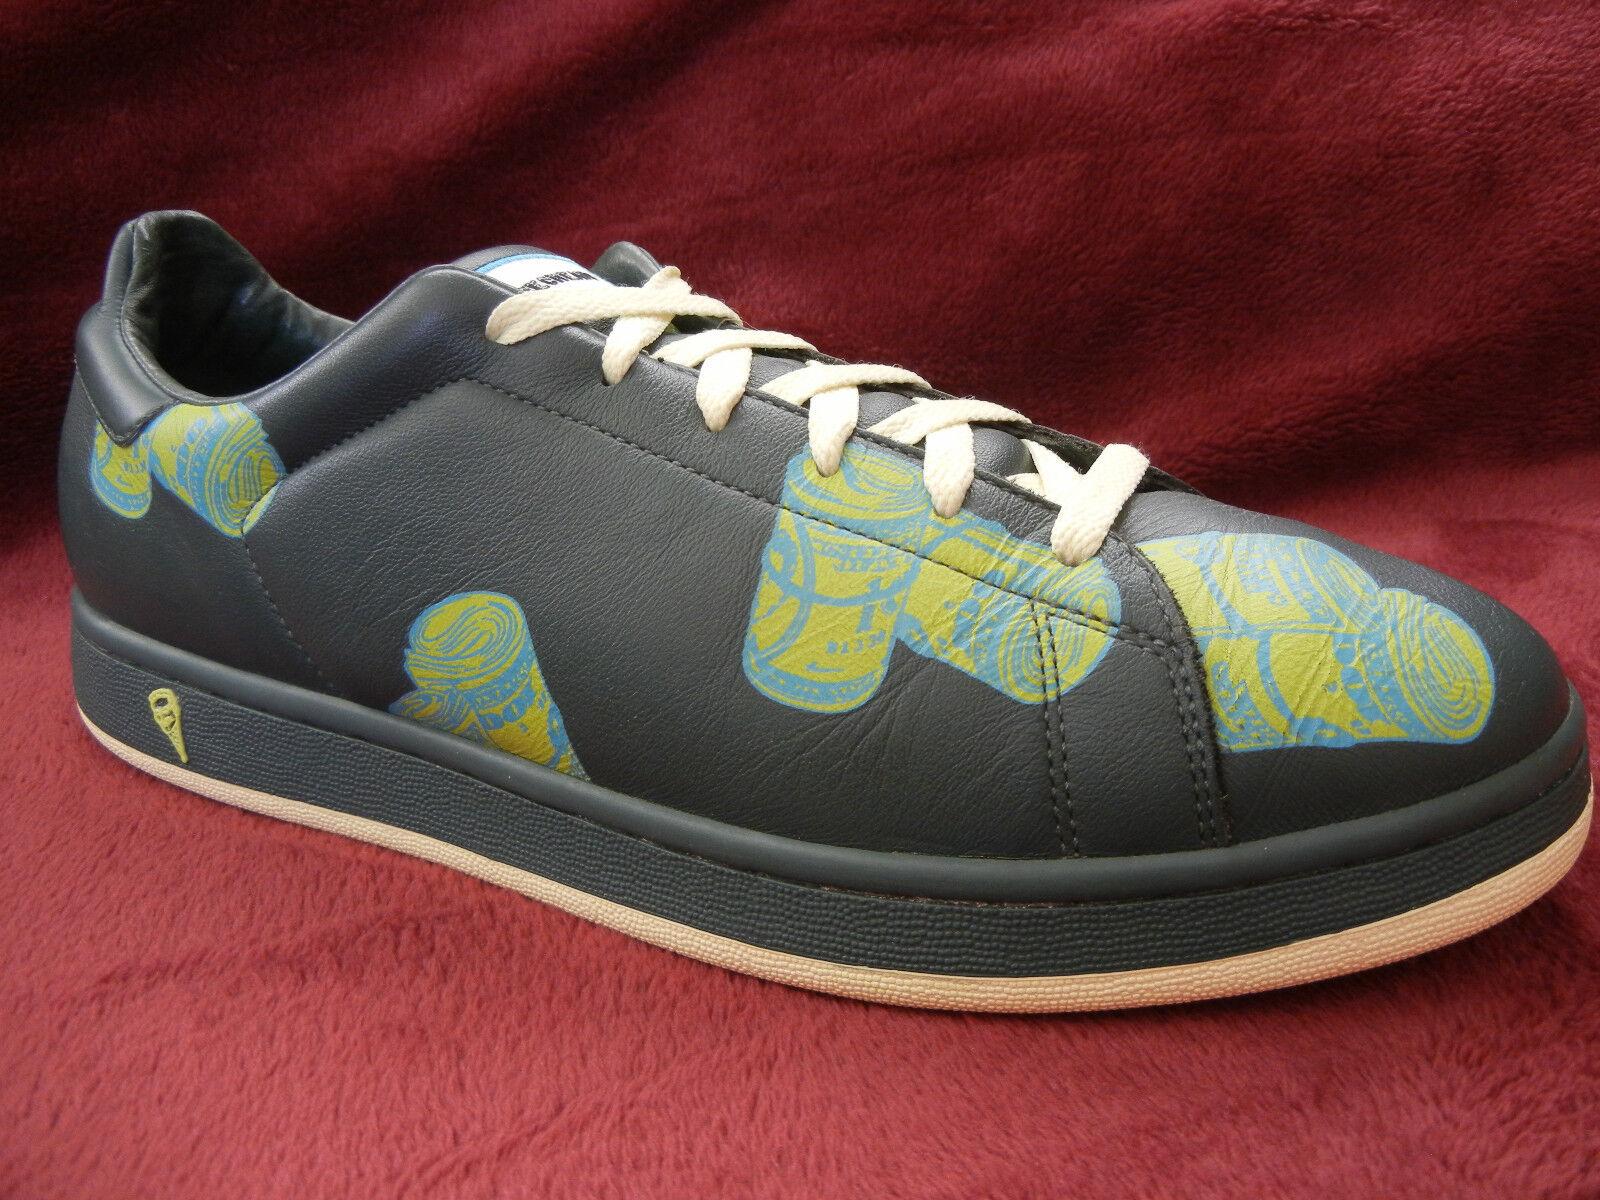 Reebok Ice Cream BIG BENDI GRN  MONEYROLLS sneakers SIZE 12  BBCICECREAM RARE